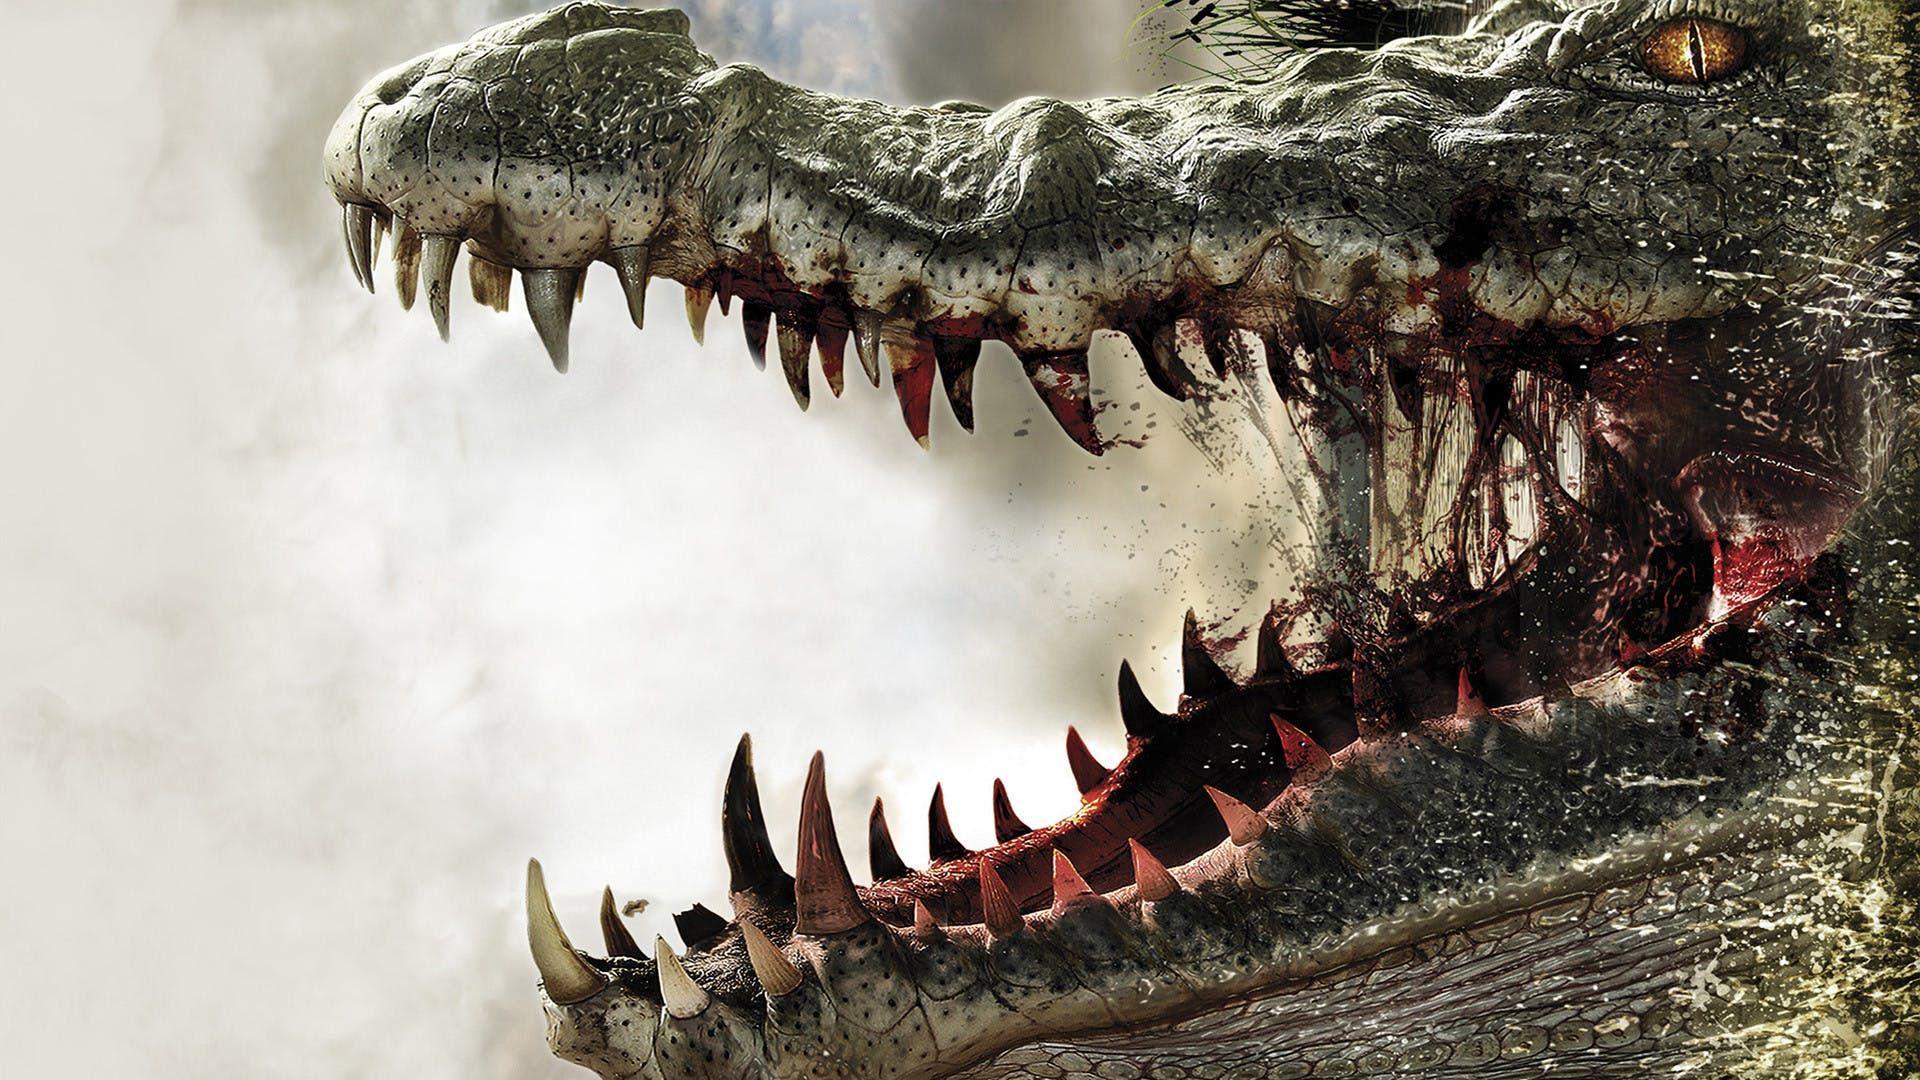 Watch The Film Lake Placid Crocodile